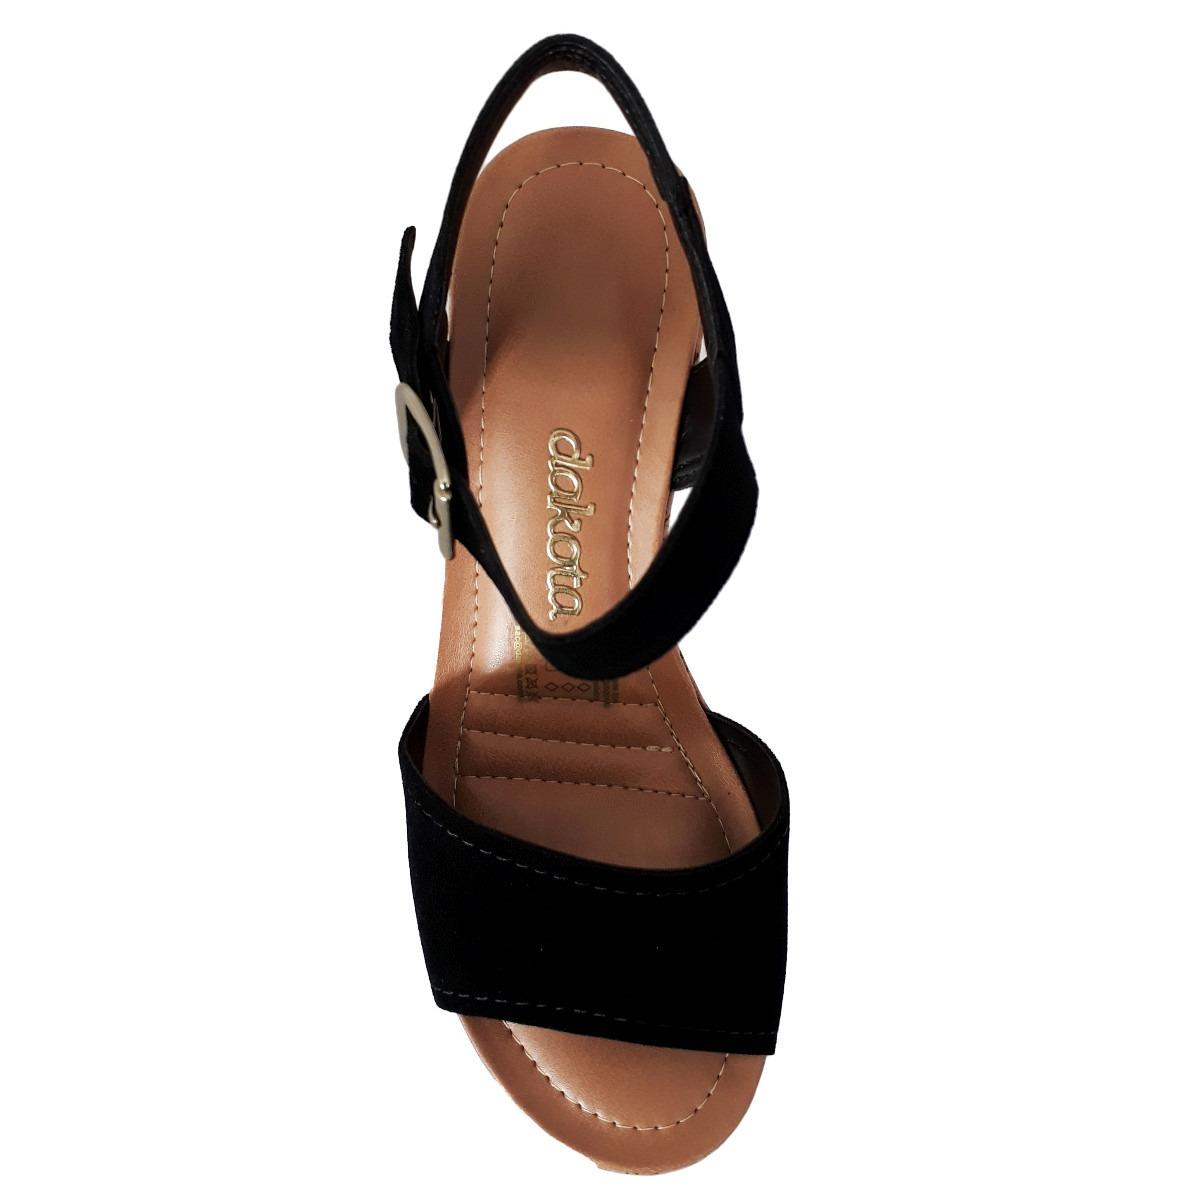 a22ed0ab38 sandália feminina dakota plataforma beltinci preto z2393. Carregando zoom.